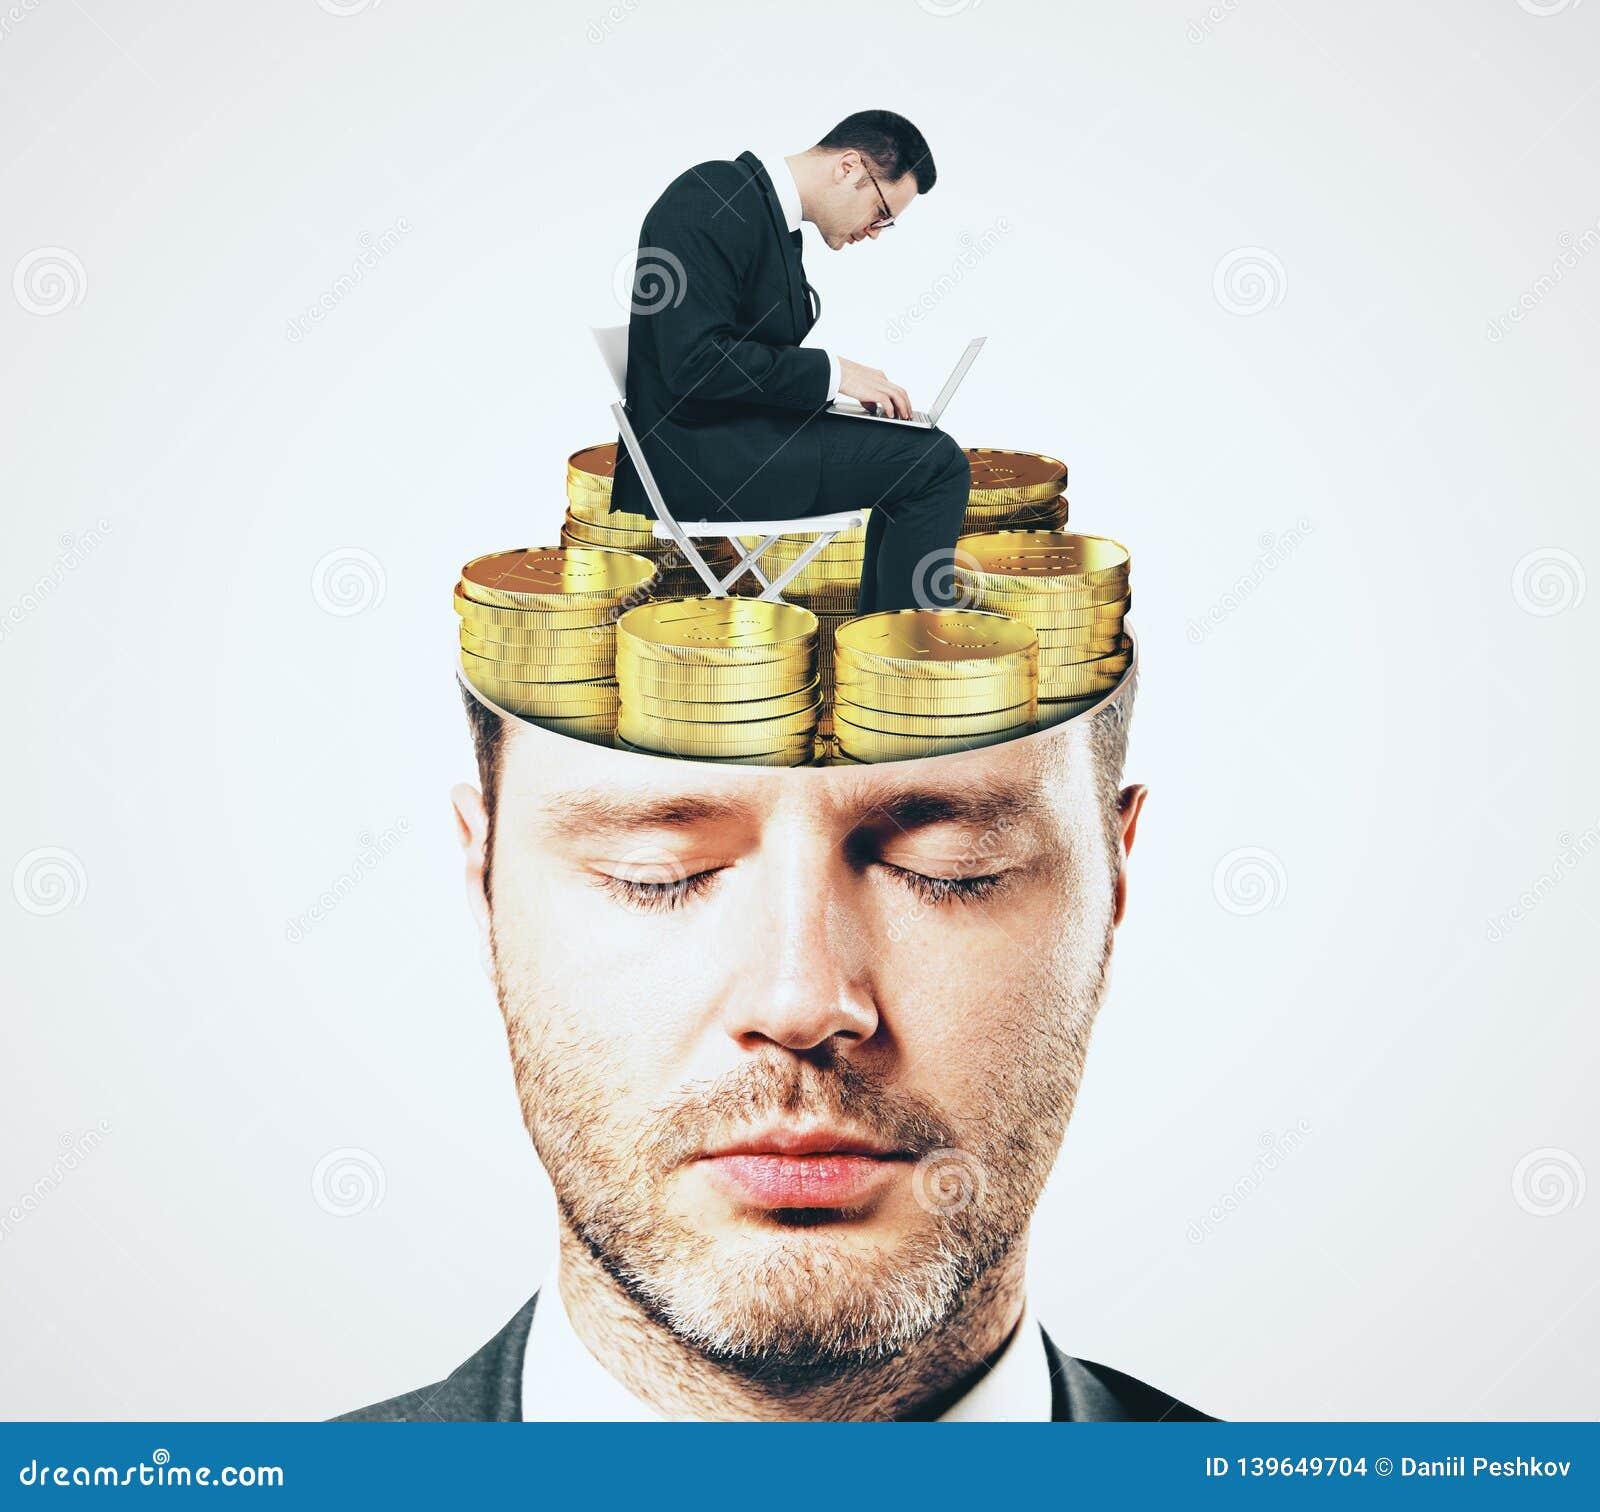 Focus and money concept